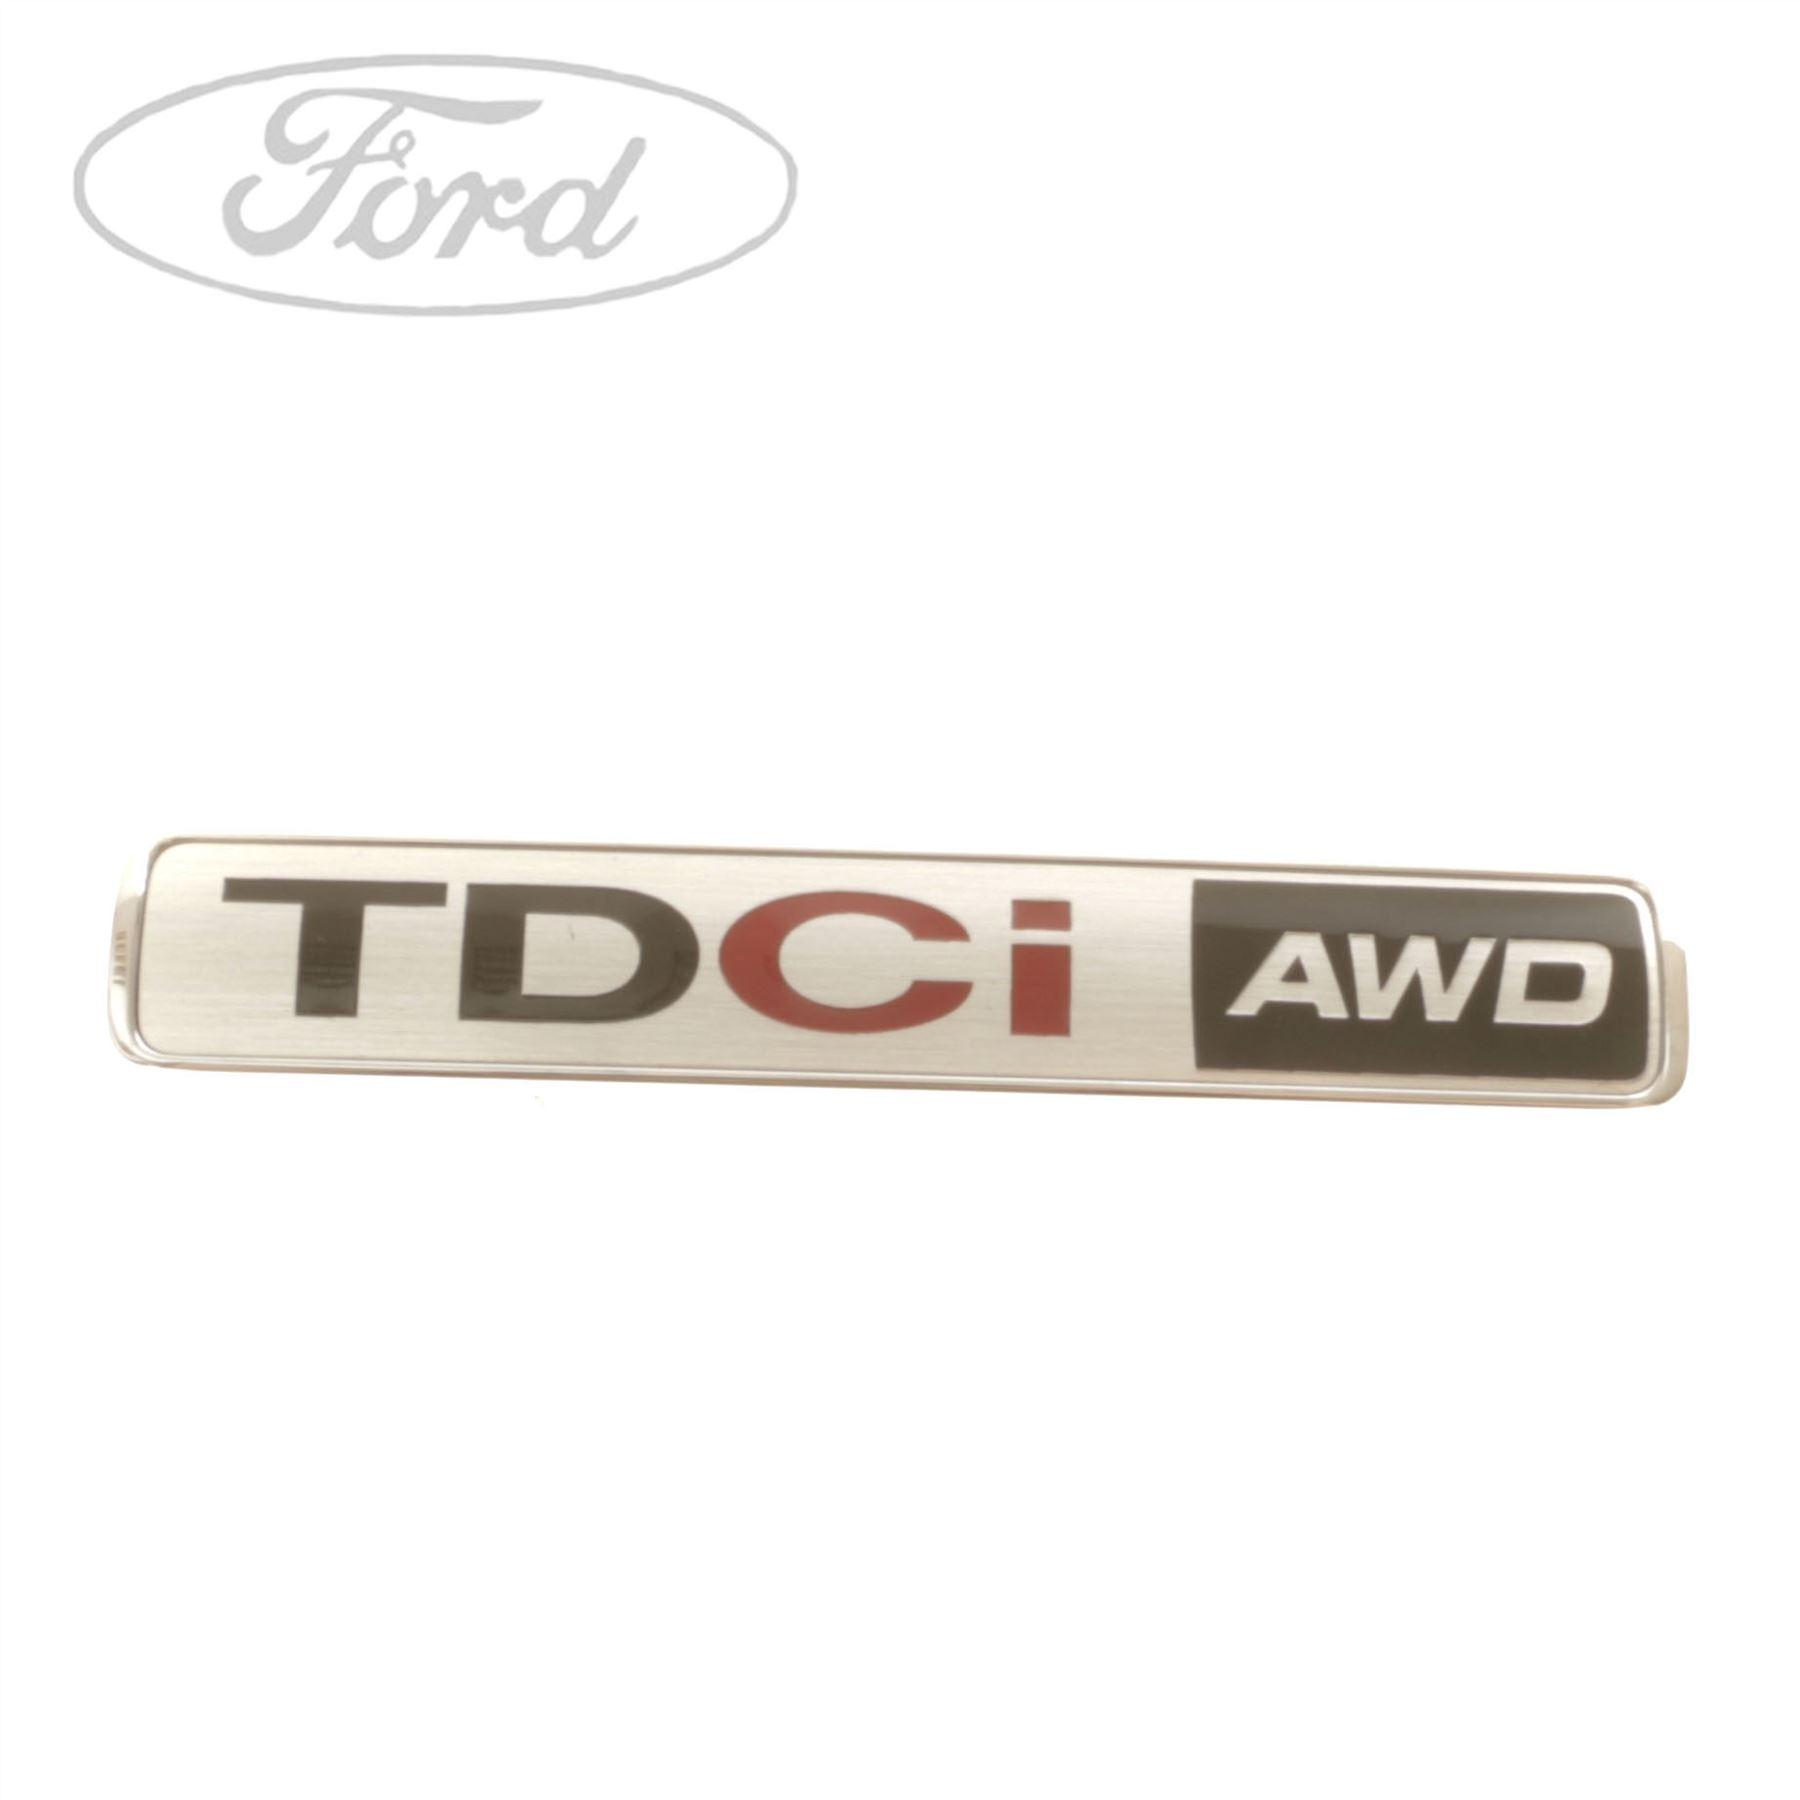 Genuine Ford Kuga 20 Tdci Awd Name Plate Badge Emblem Diesel Fuse Box 1798754